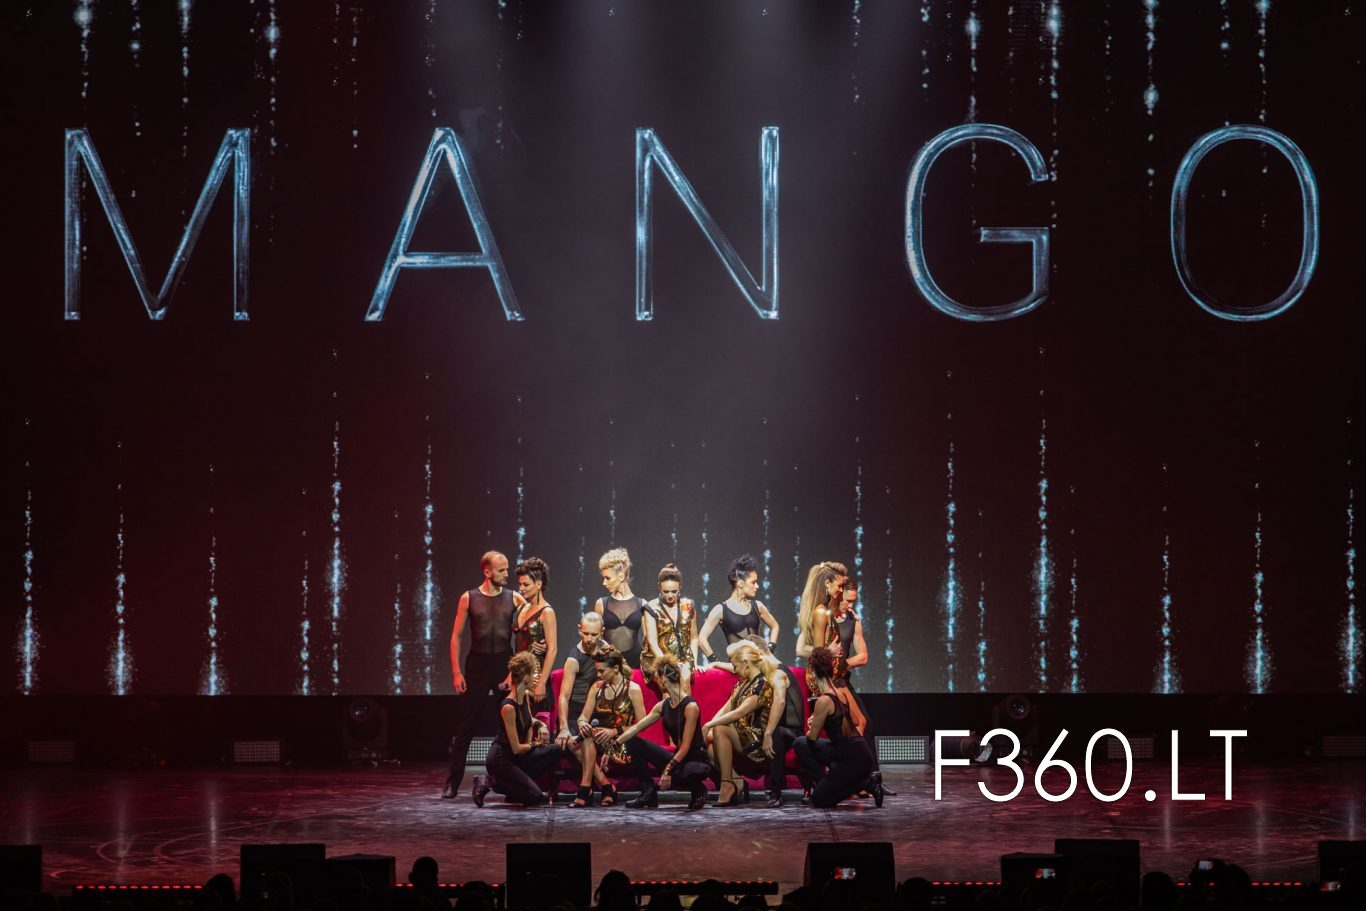 Re264 Grupes 'mango' 20 Metcio Koncertas. Klaipeda Reportazinis Renginiu Fotografavimas F360lt 3t4a5436